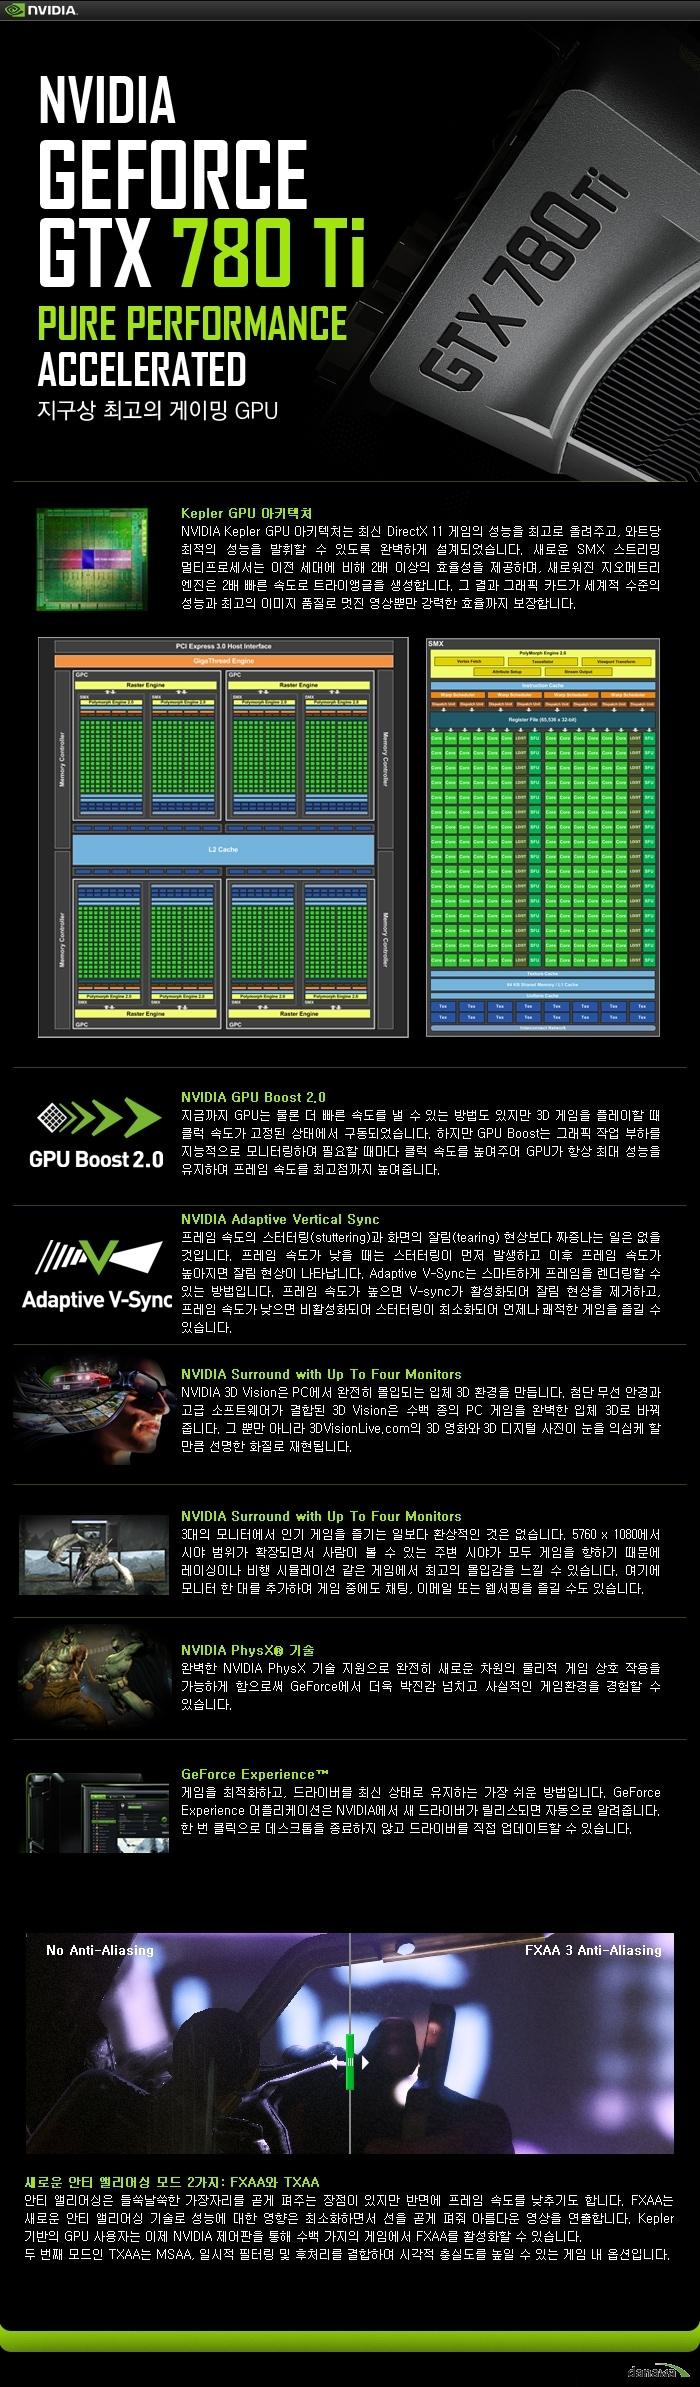 NVIDIA 기술 설명